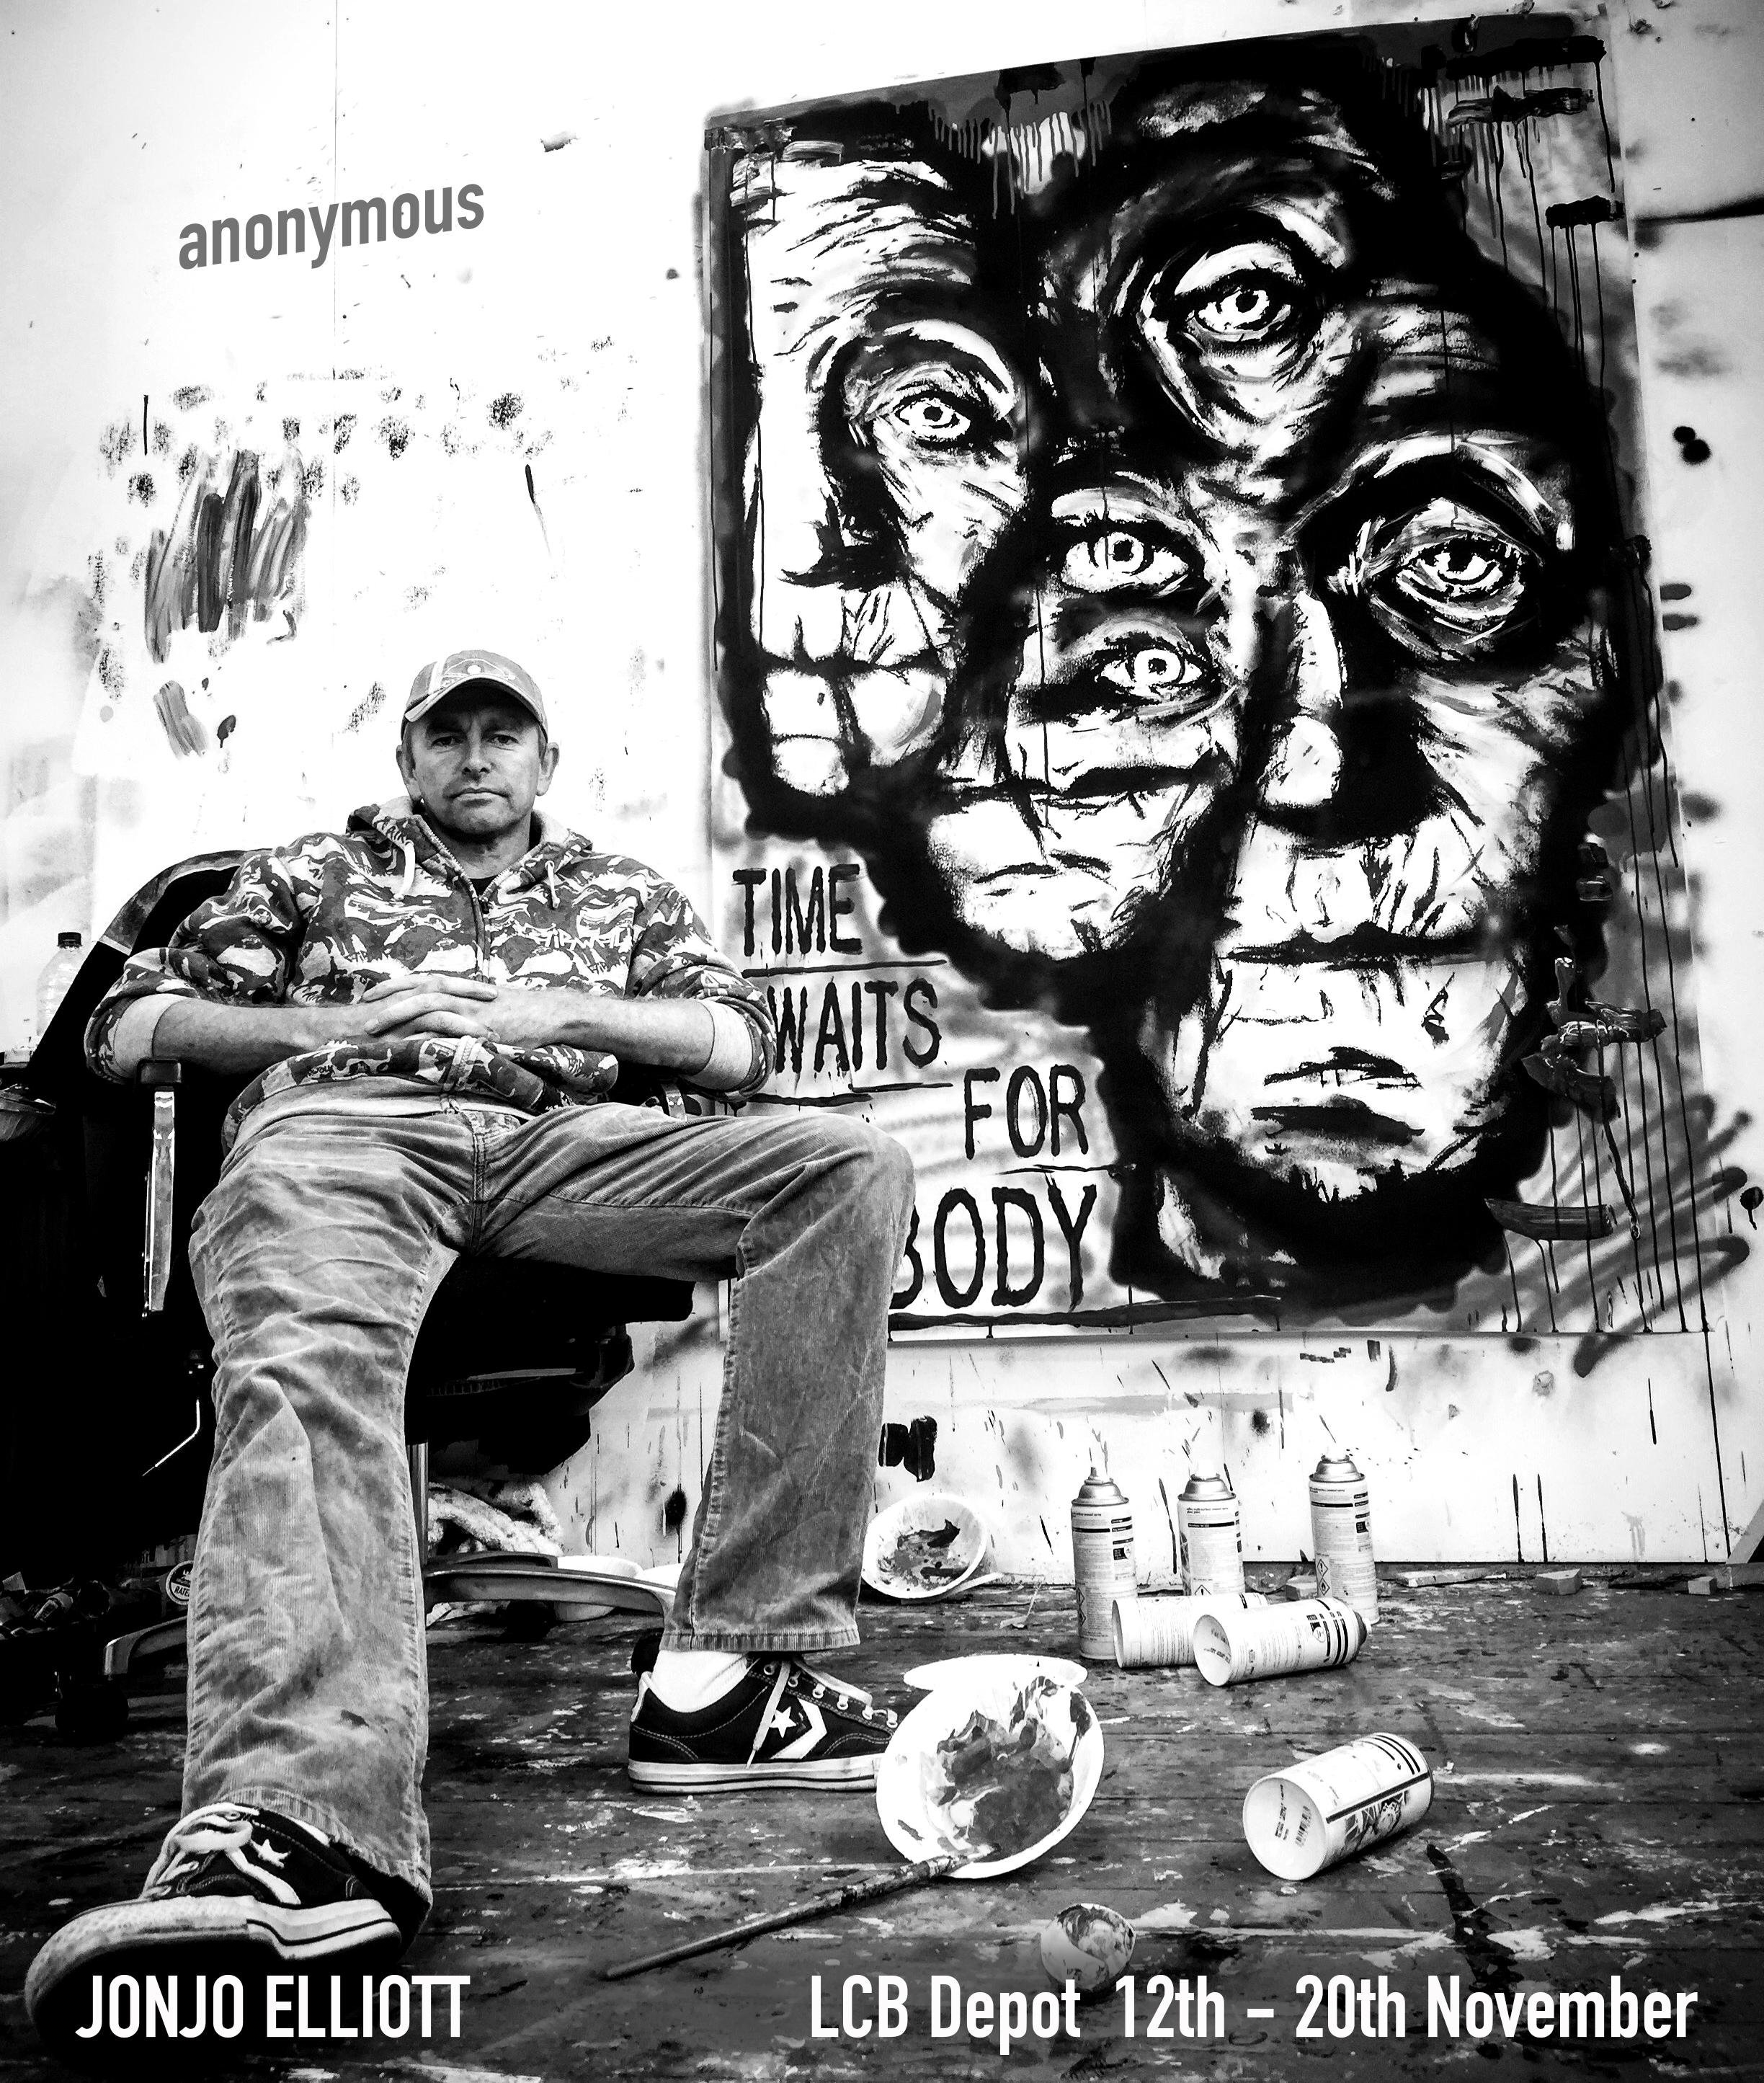 Jonjo Elliott's Anonymous poster